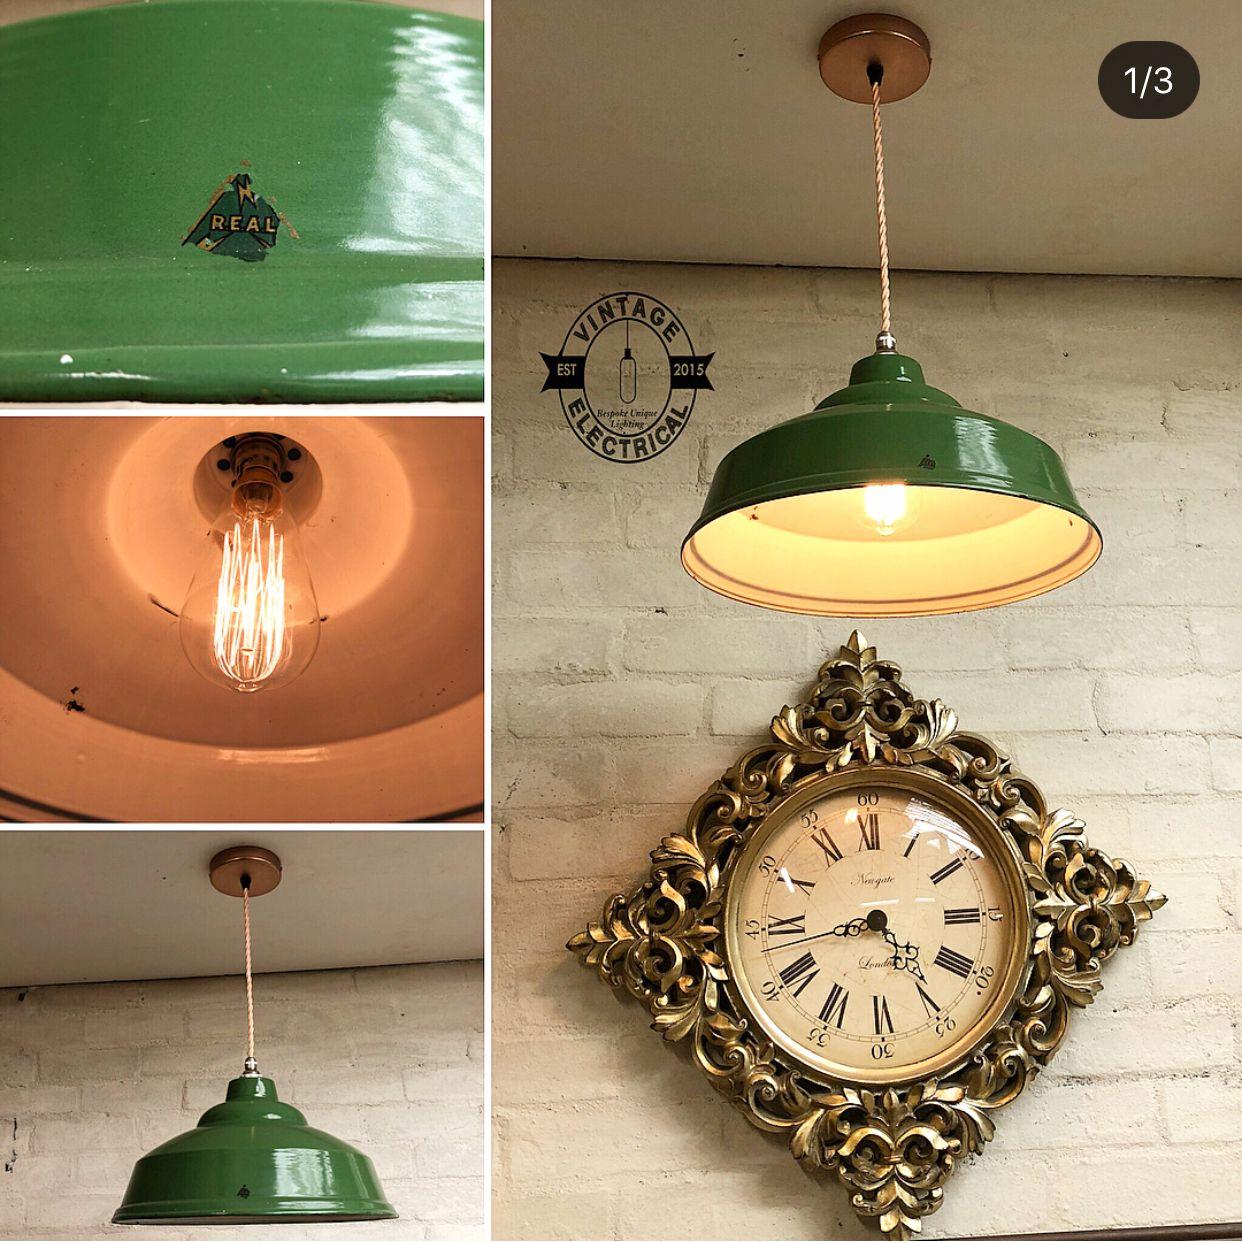 R E A L Green Enamel Coated Pendant Drop Light Vintage Lights 1920 1960 Vintage Electrical Ltd Drop Pendant Lights Vintage Lighting Farmhouse Lamps